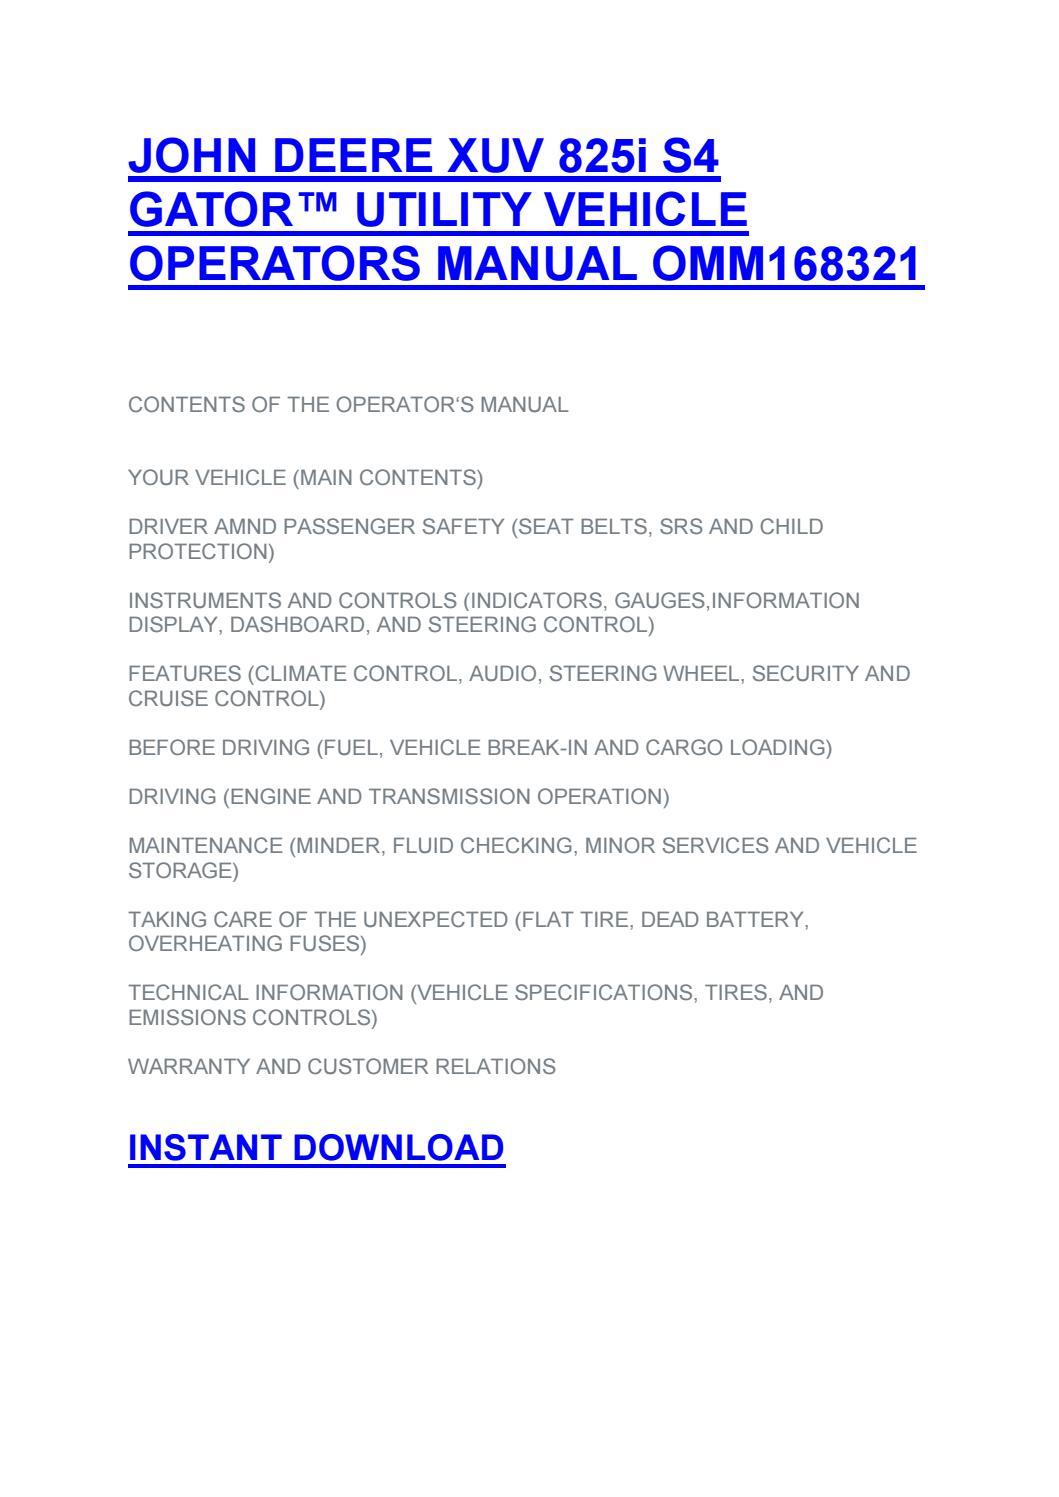 John deere xuv 855d gator™ utility vehicle operators manual omm166784 by  Todd Gilbert - issuu